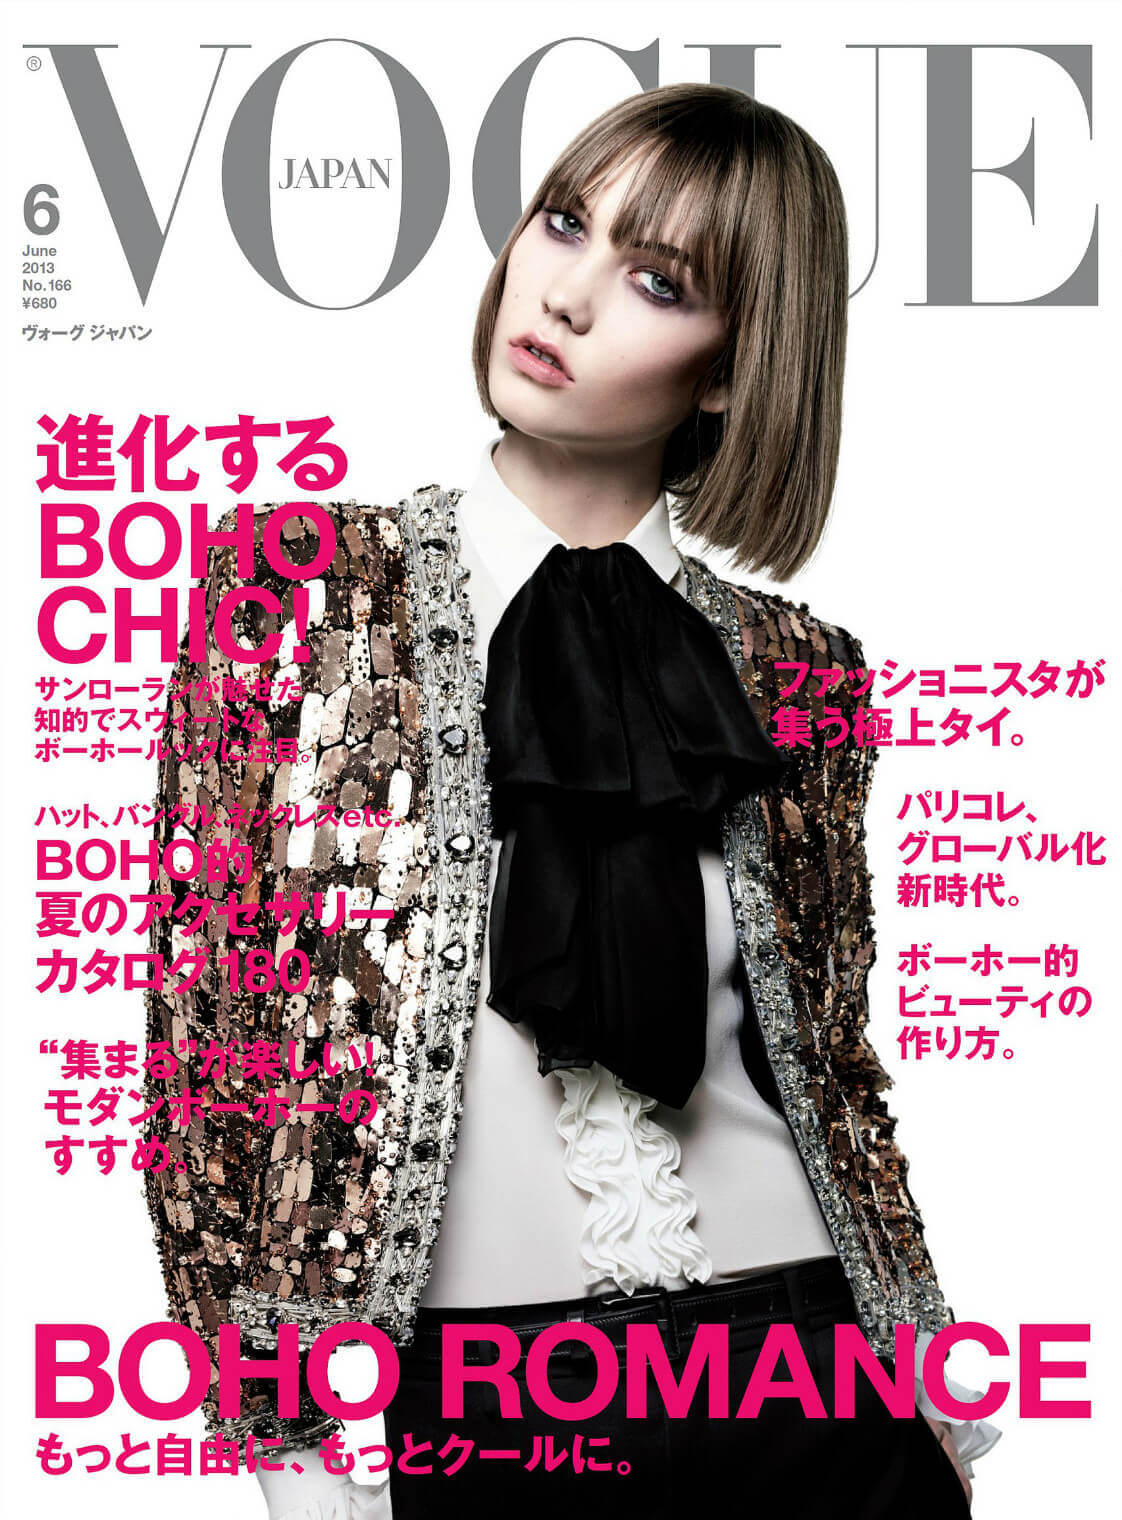 Vogue-Japan-June-2013